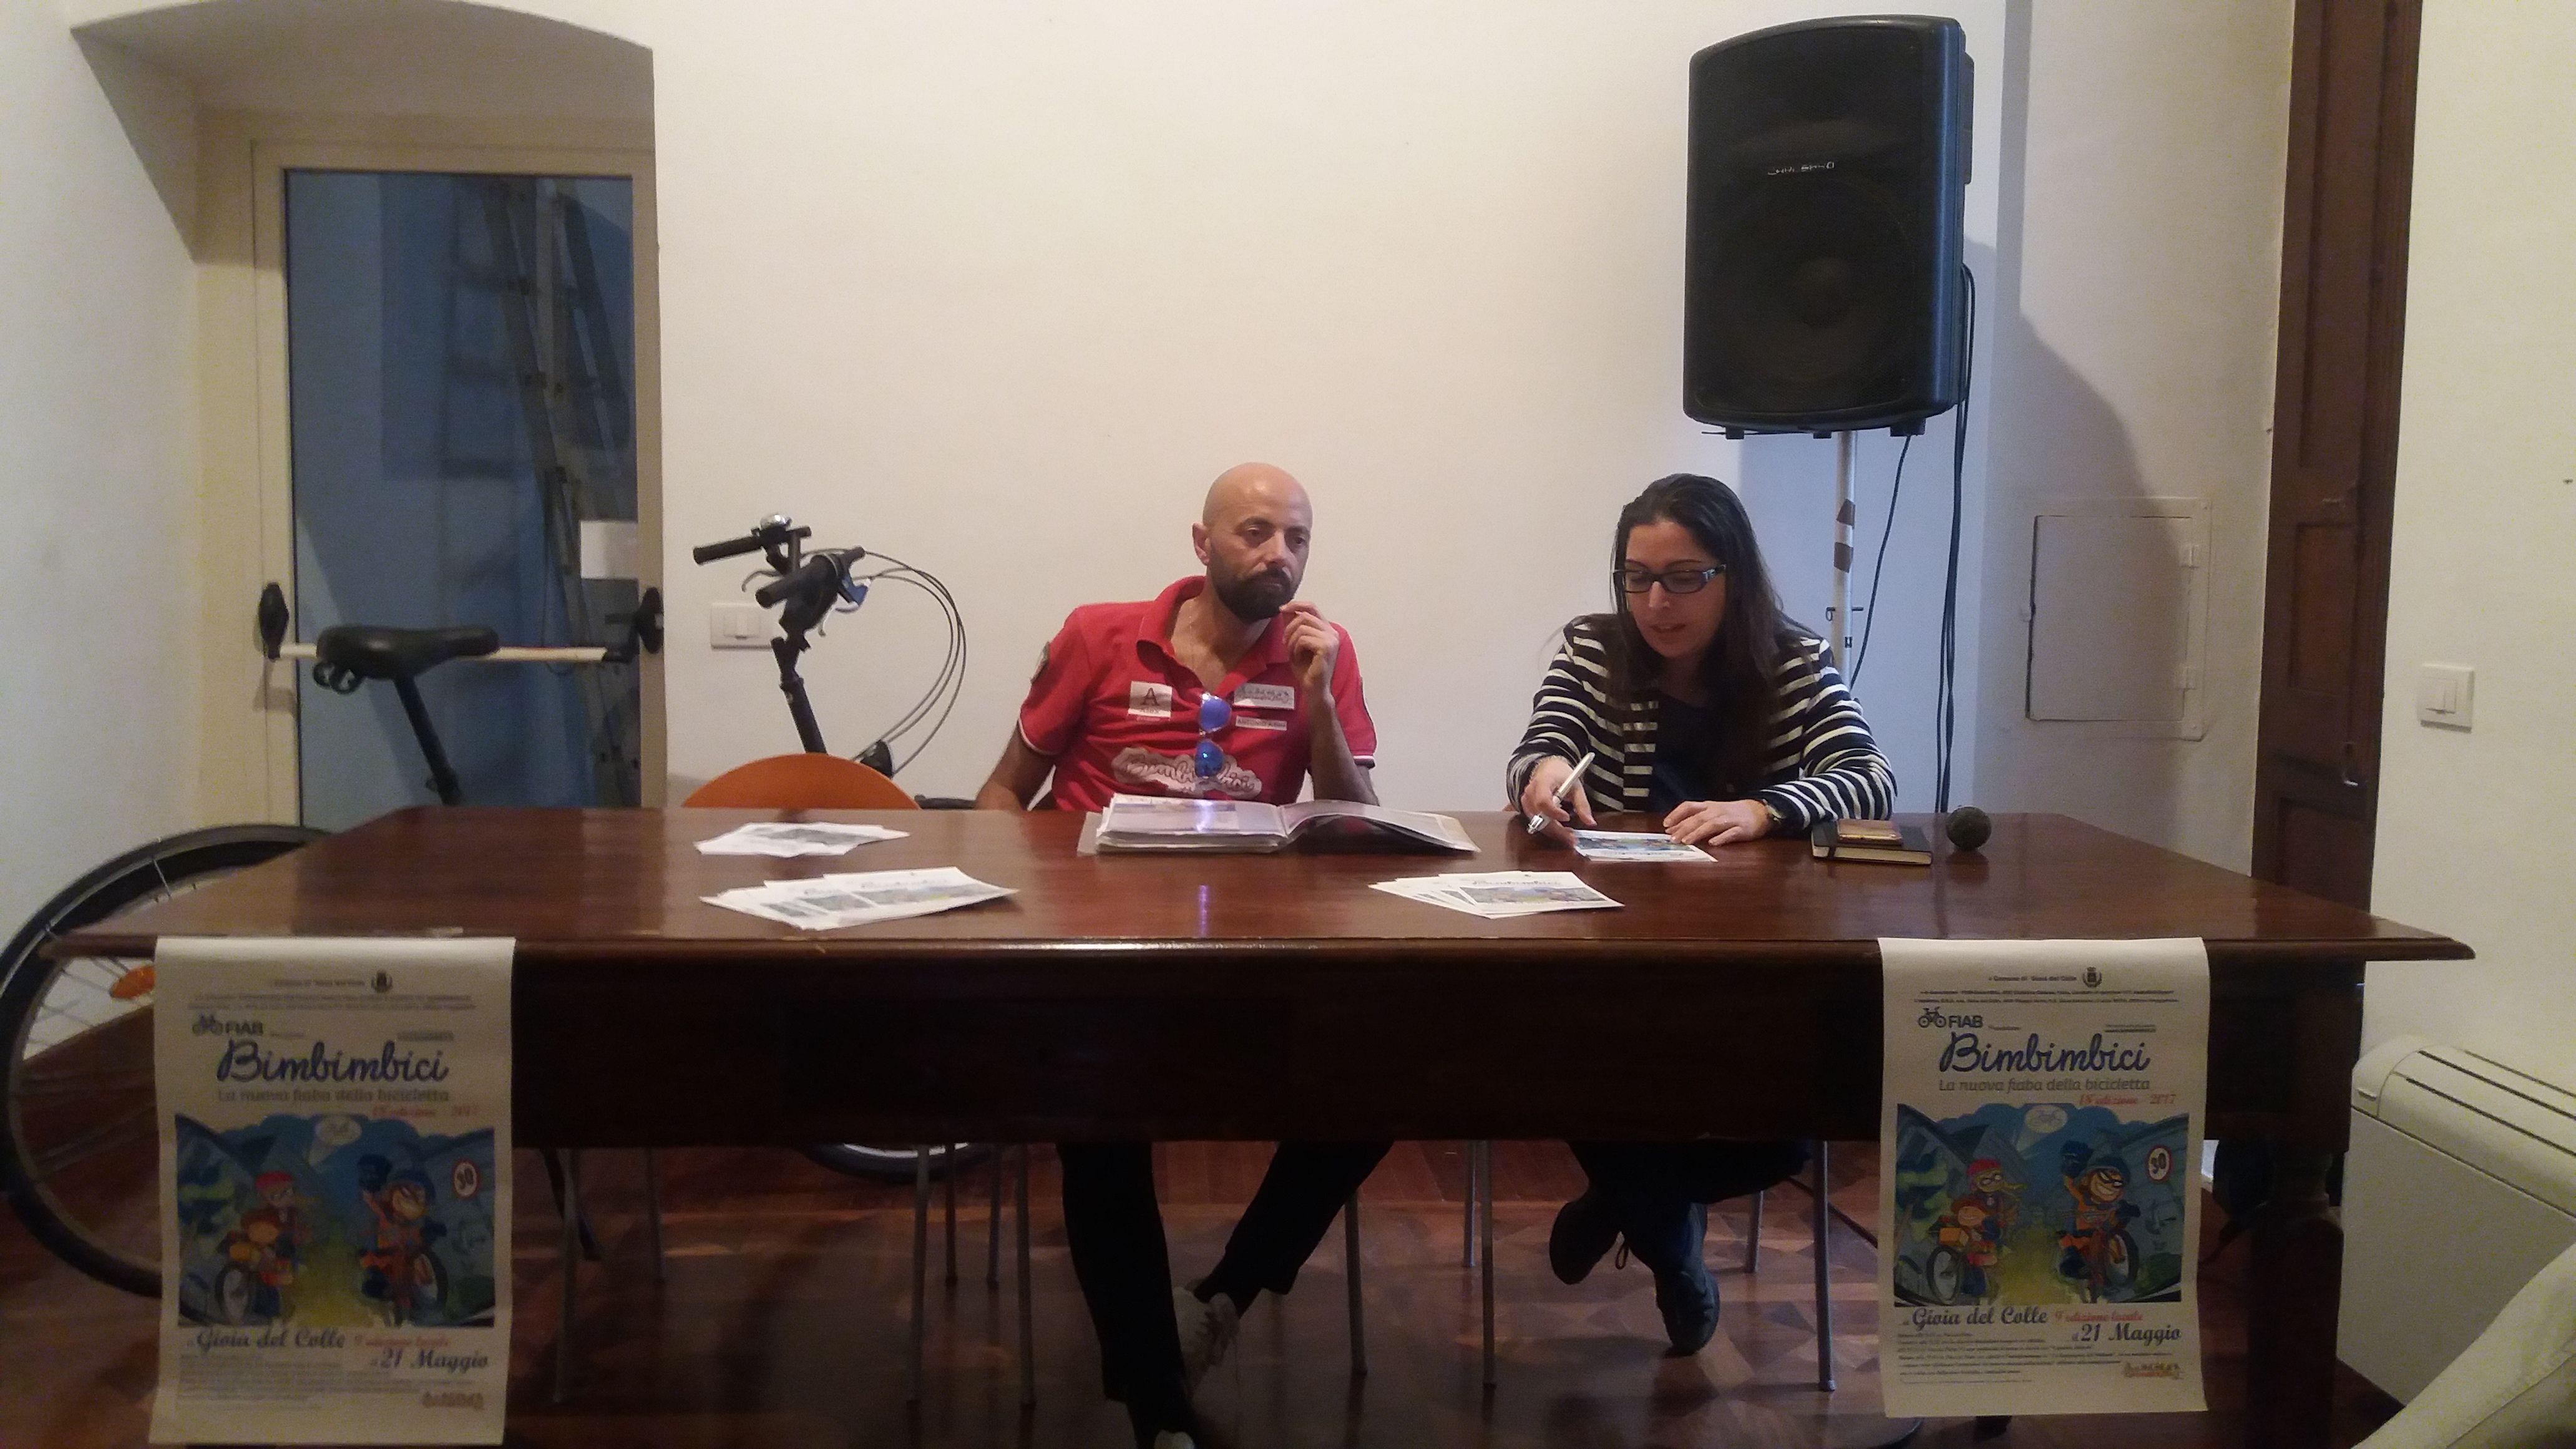 Antonio Montenegro e Daniela De Mattia e